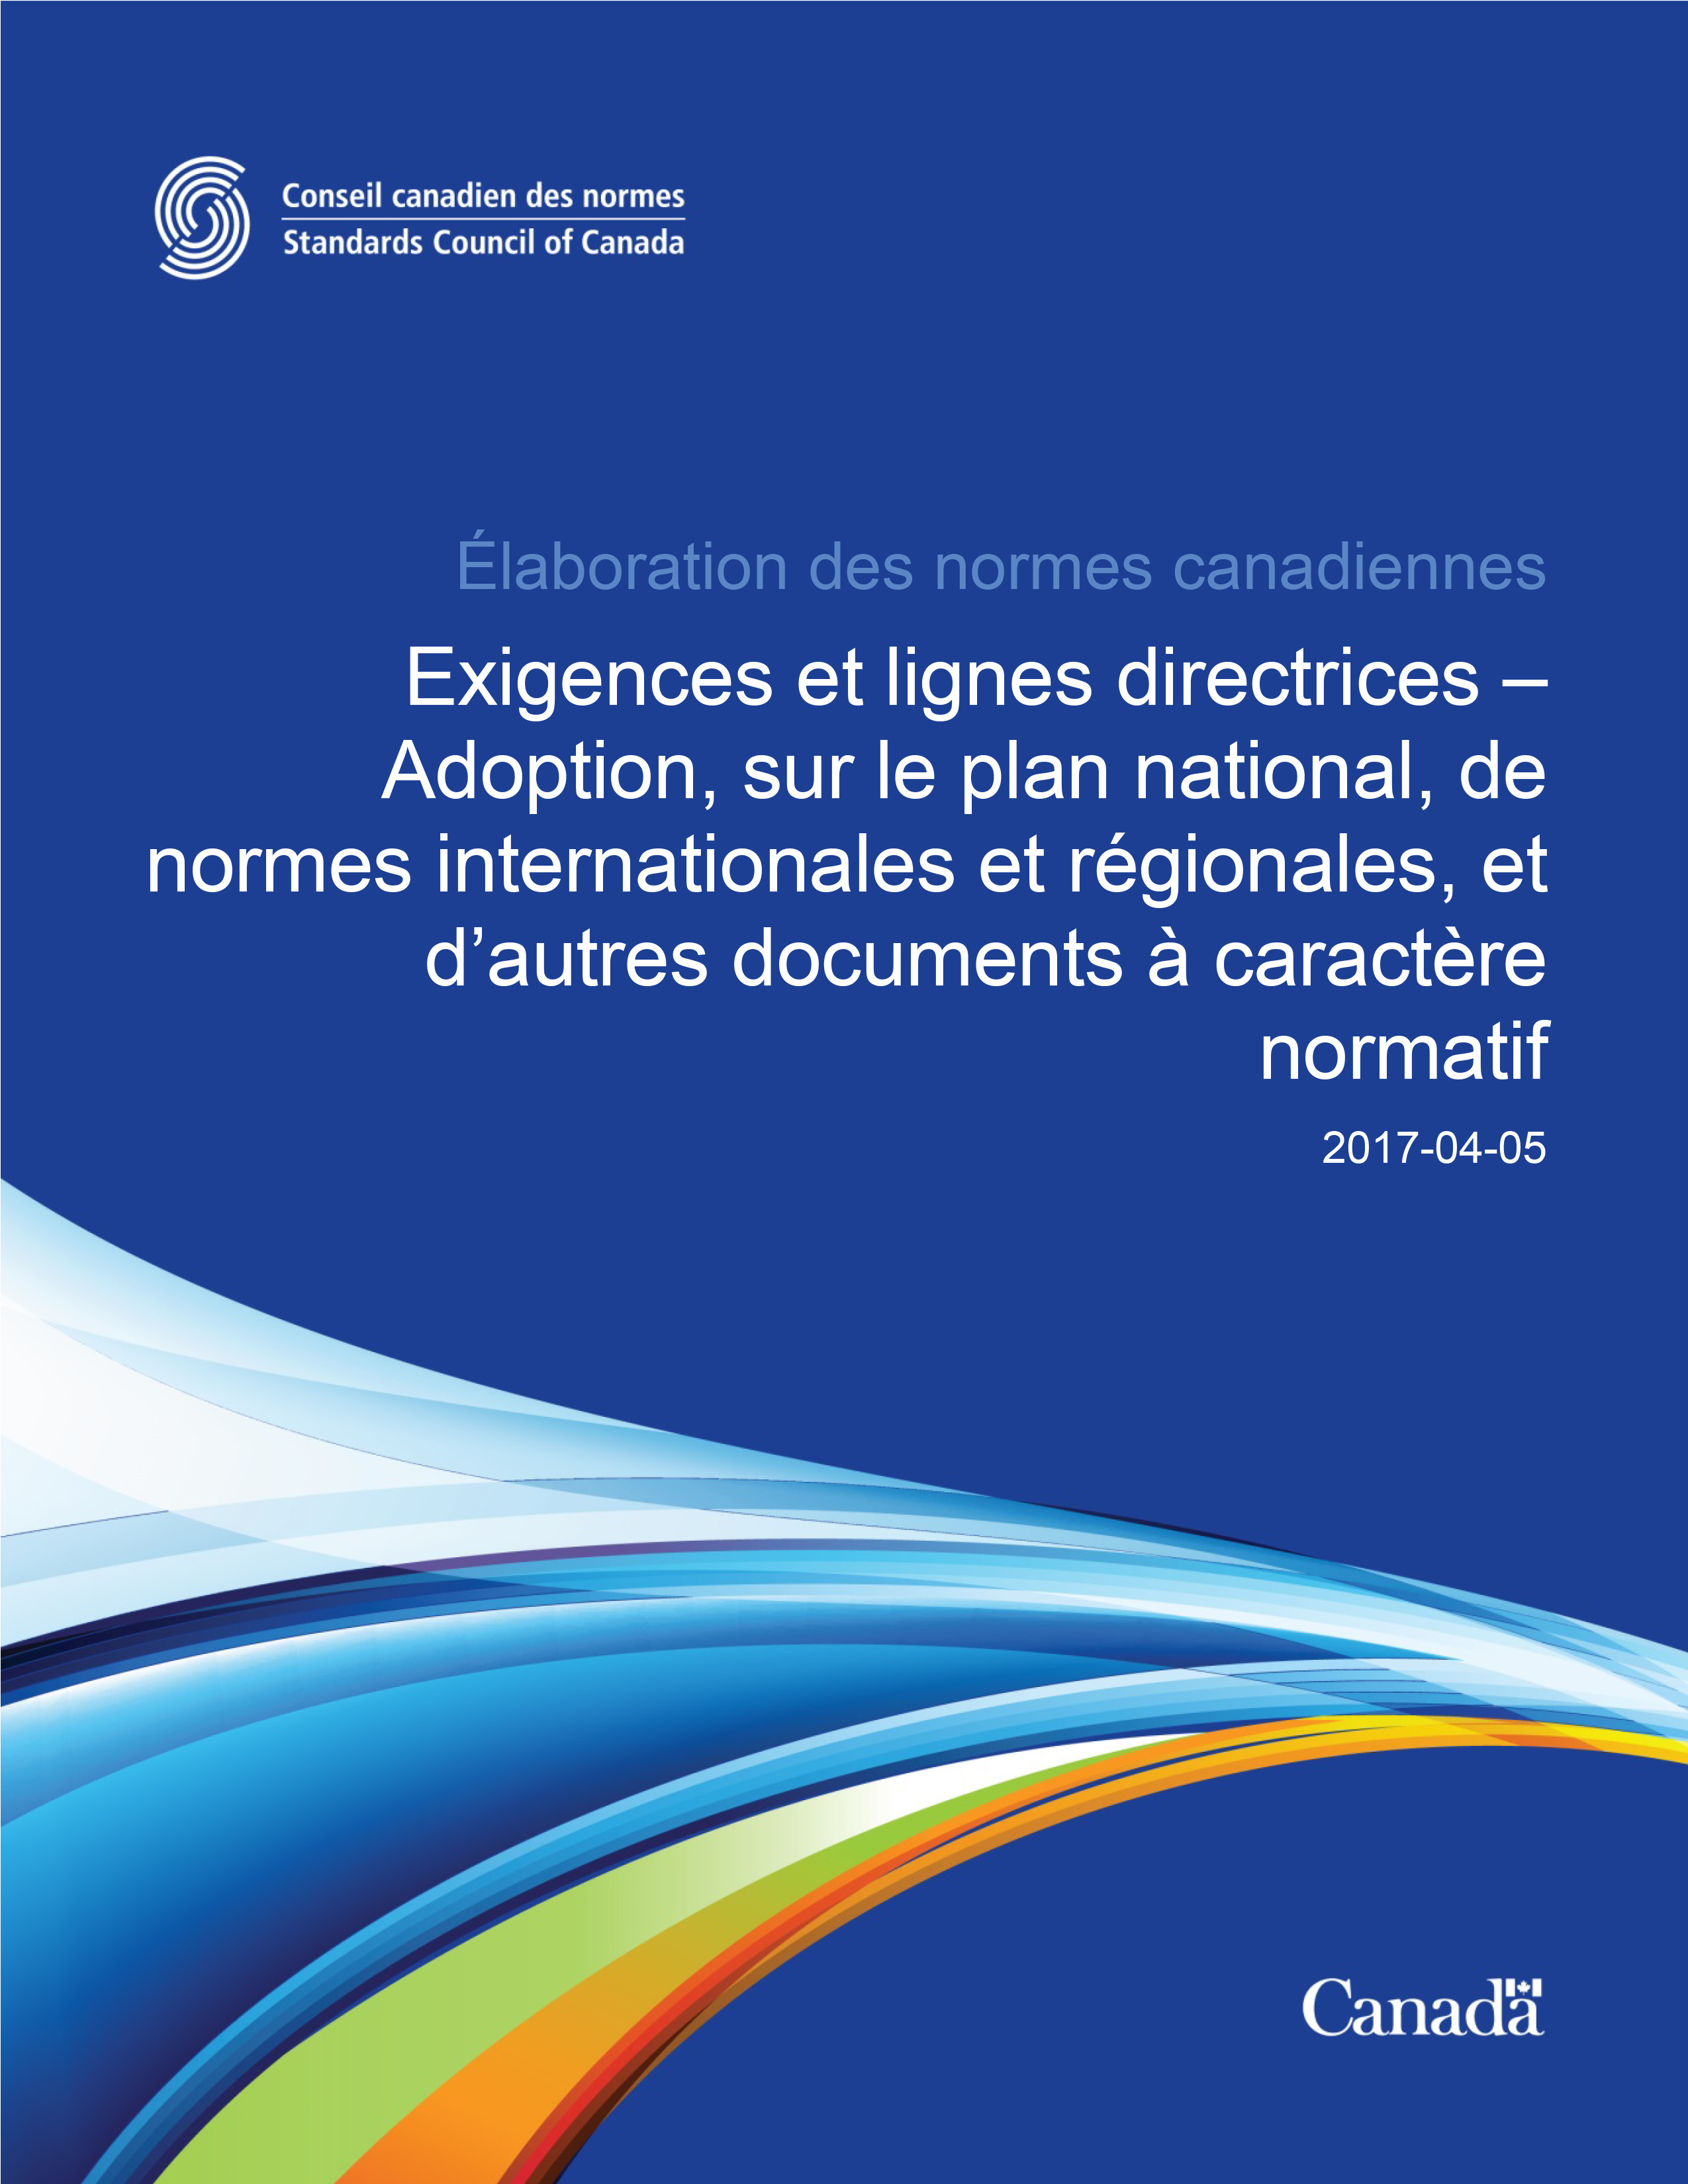 Exigences et lignes directrices – Adoption